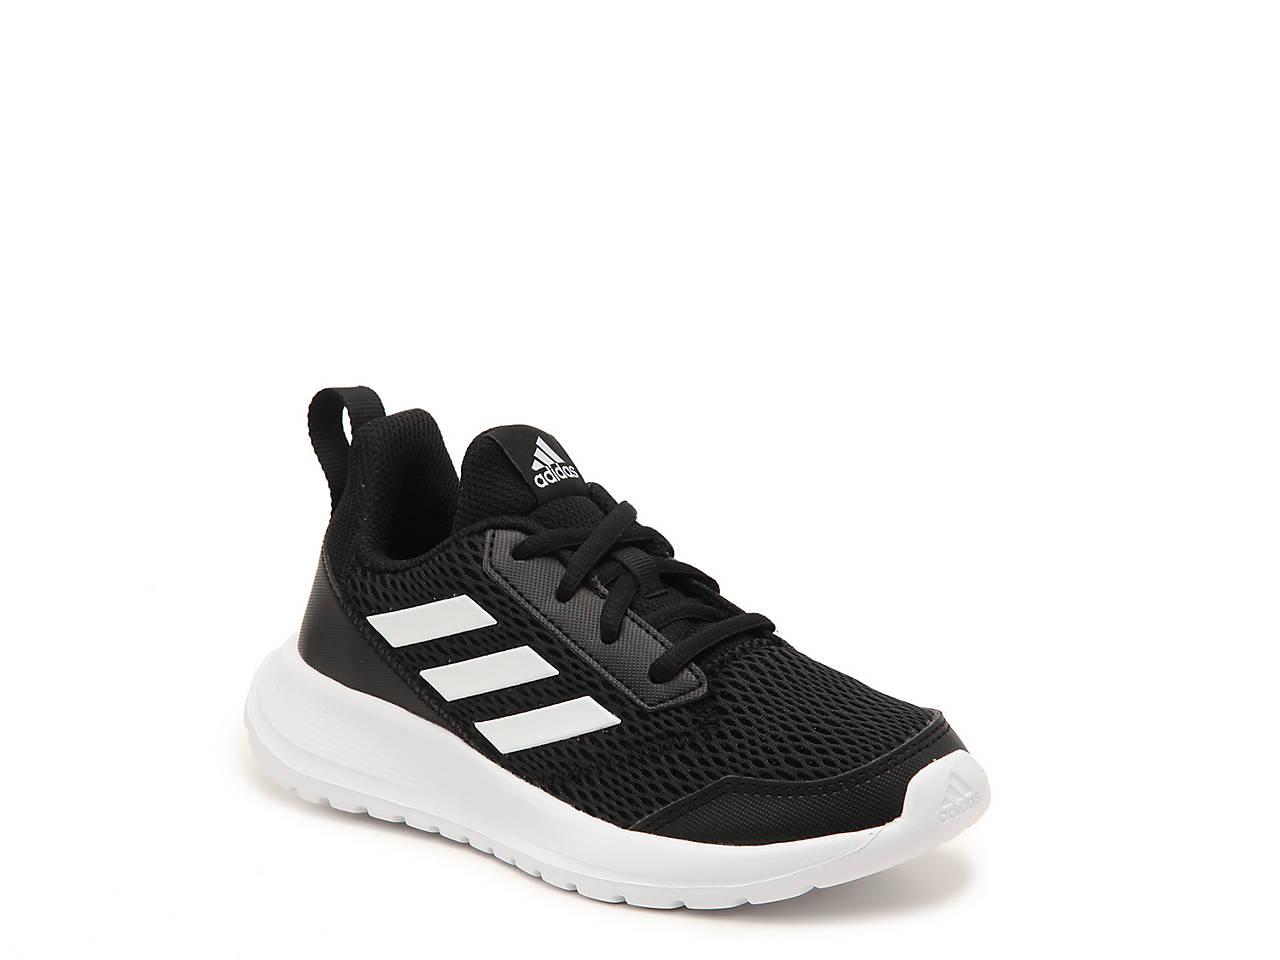 newest 0f1d7 36cc6 adidas. Altarun K ...